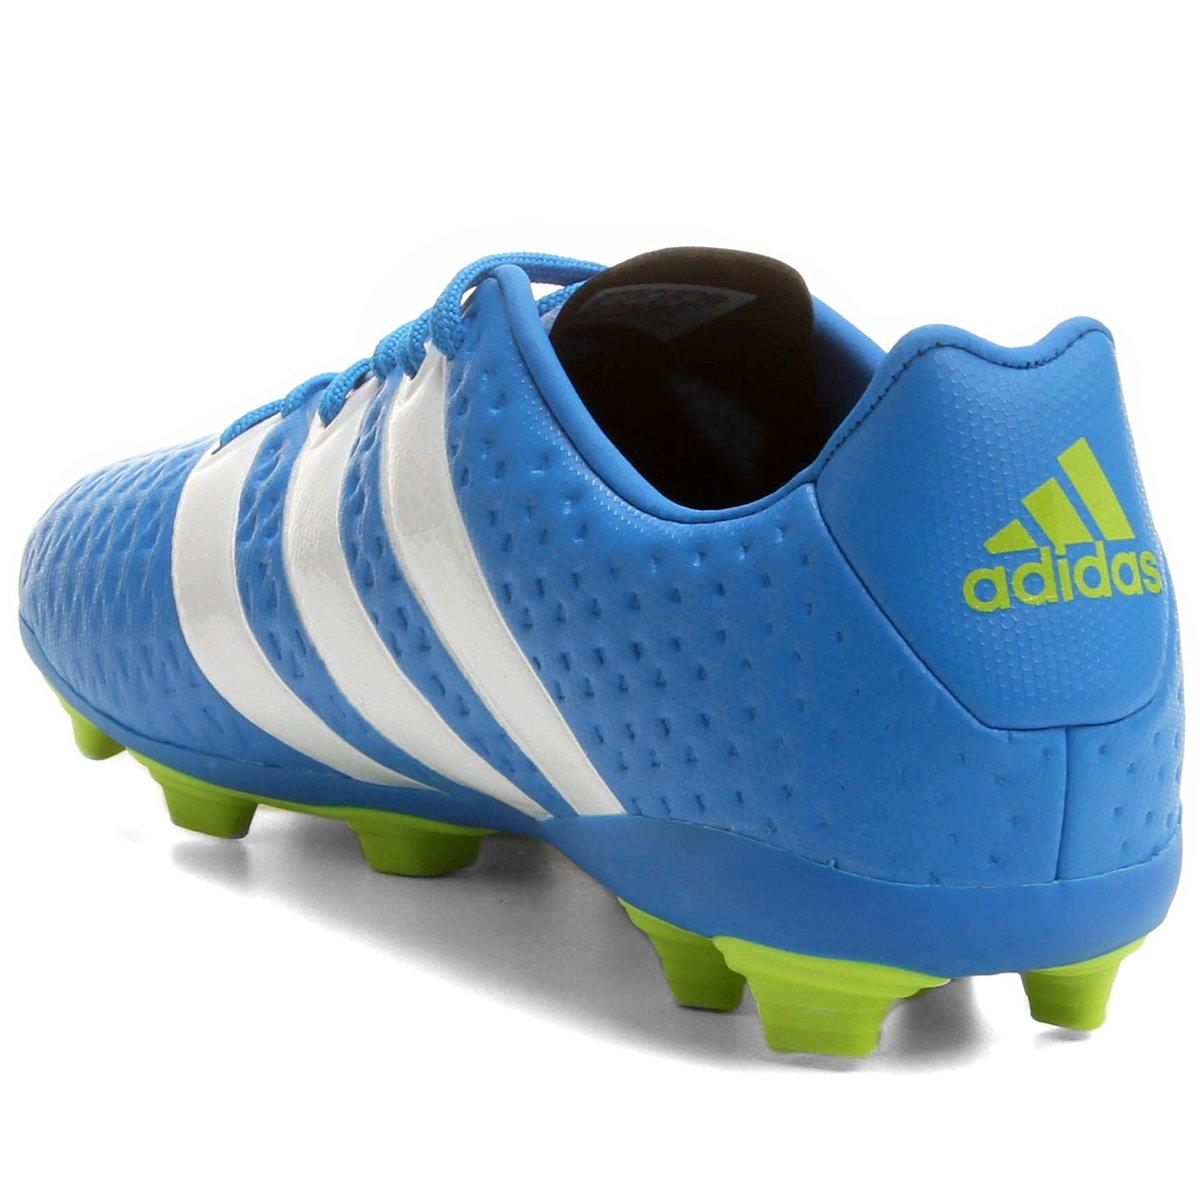 Chuteira Adidas Ace 16.4 FXG Campo Juvenil - Compre Agora  6b3316d0586d0